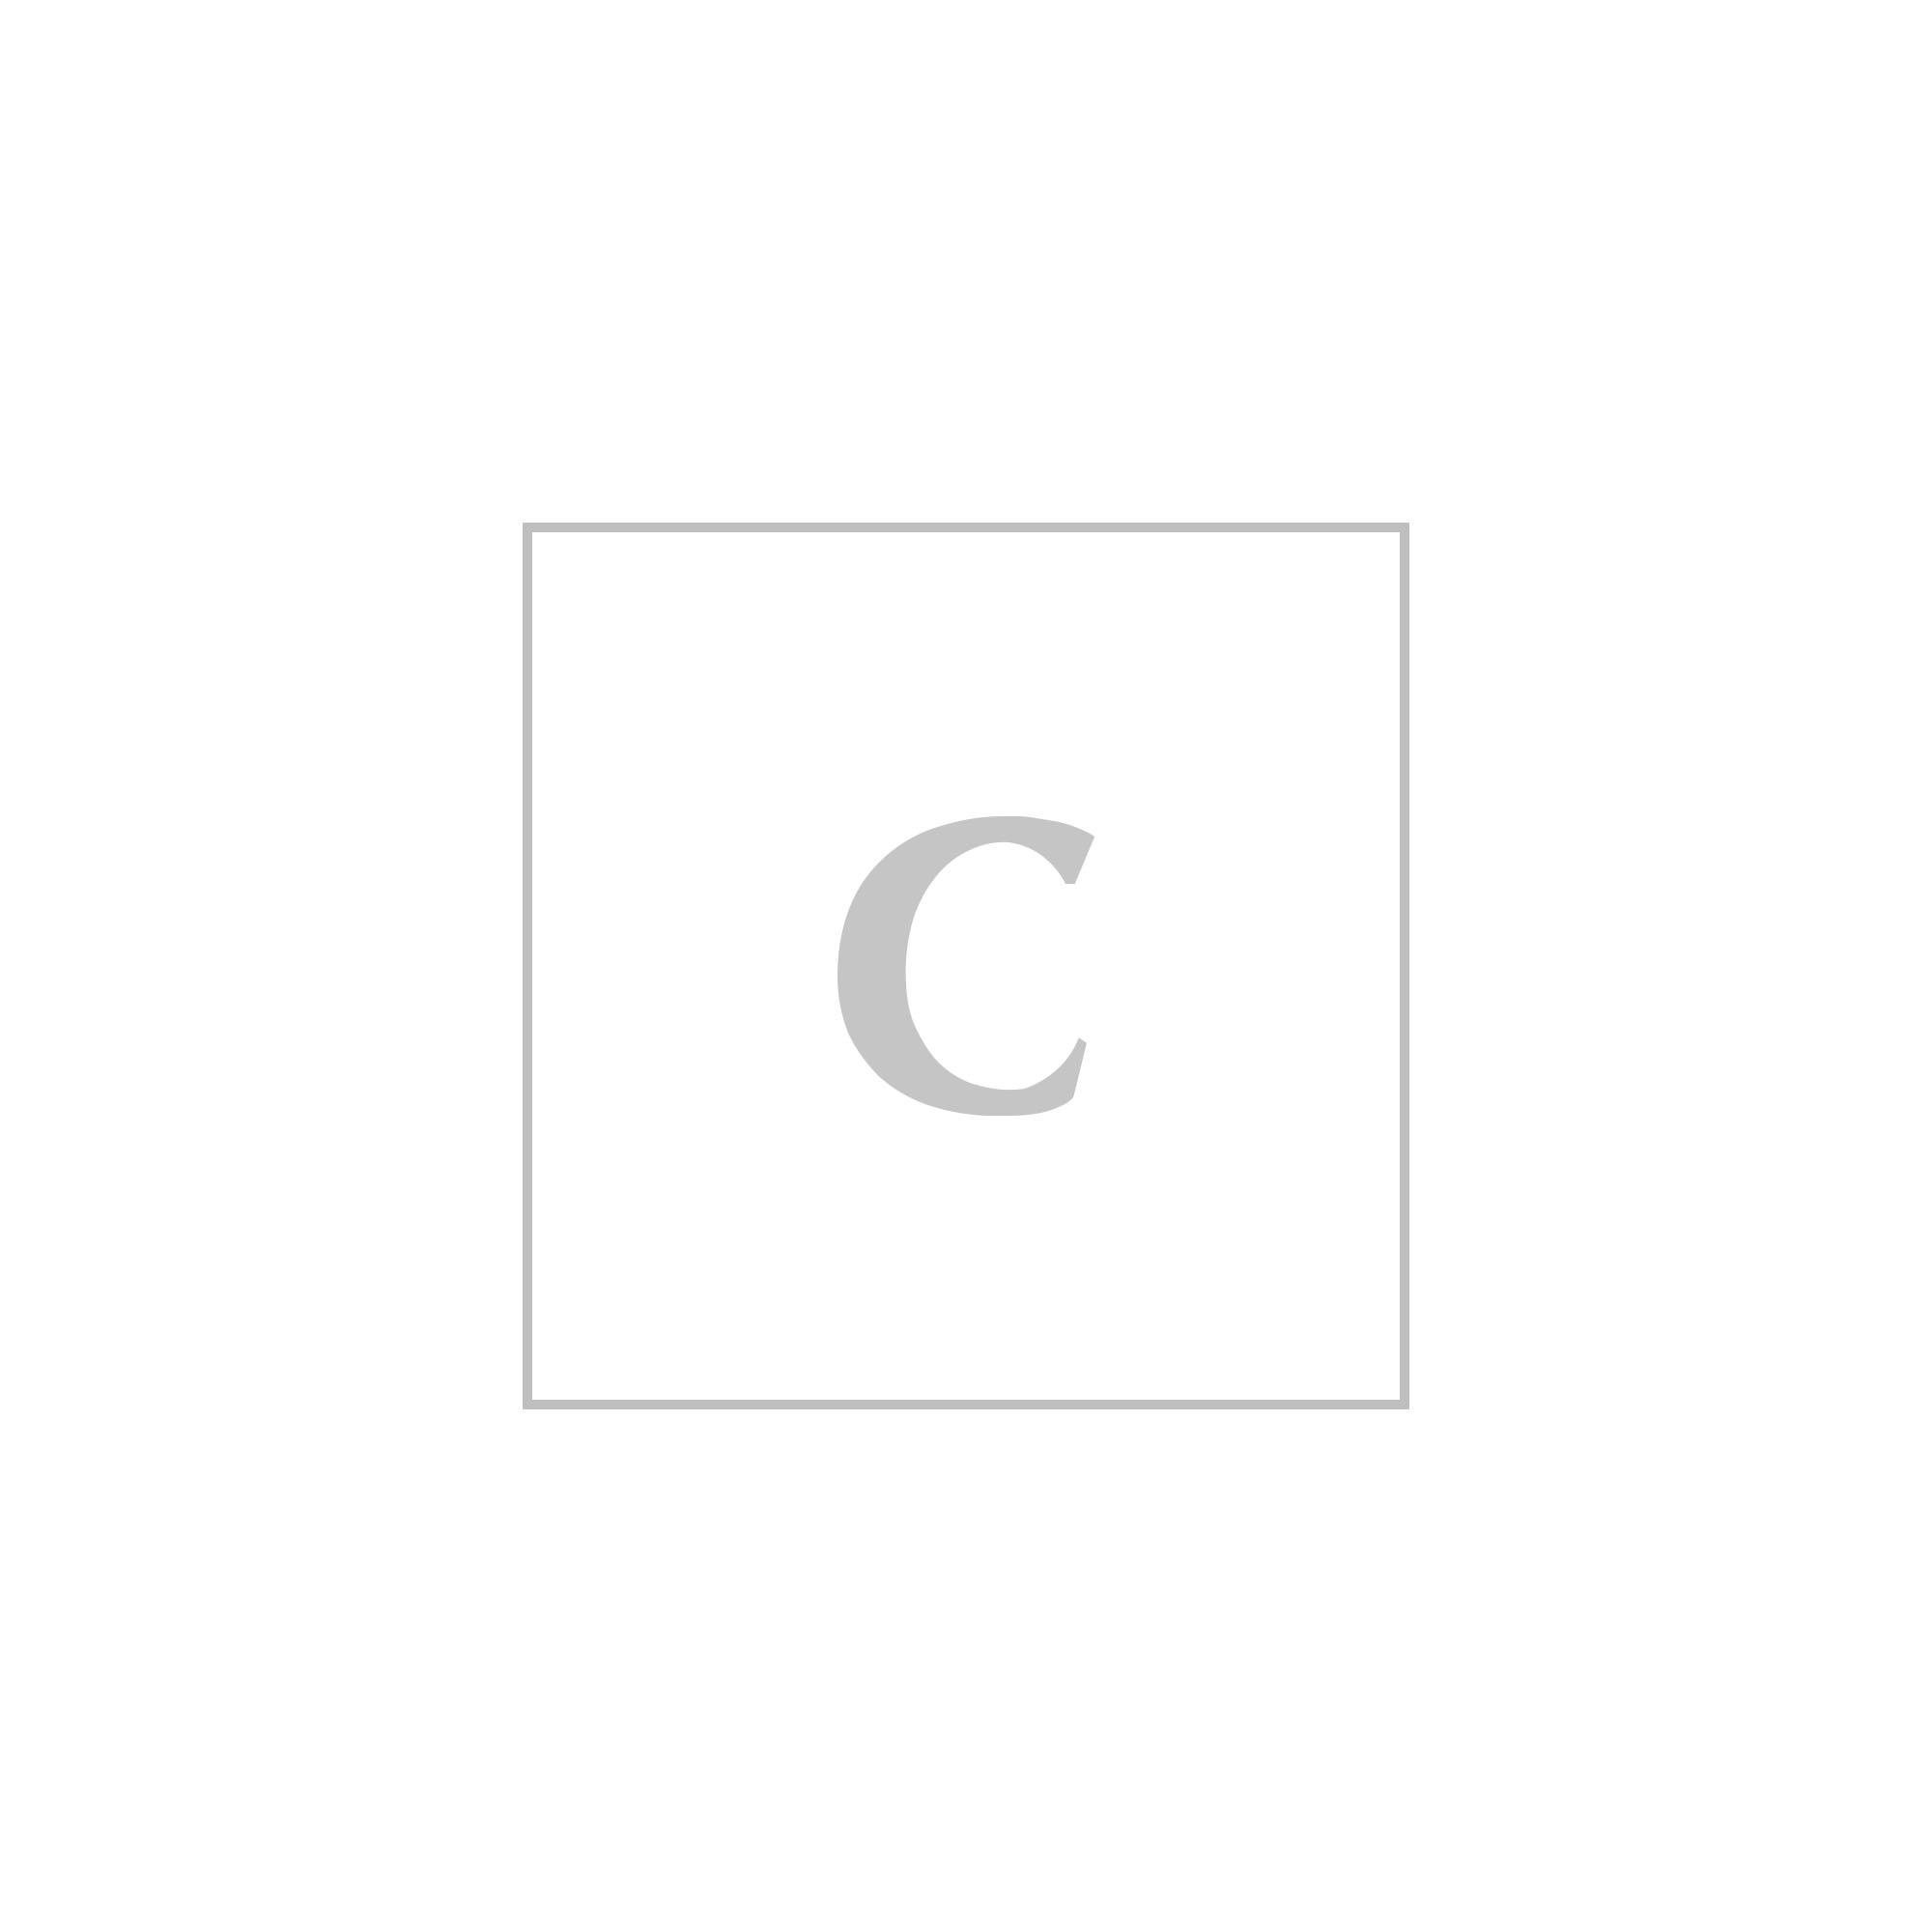 Salvatore ferragamo scarpa 2e nigel 3 028297 004 vit fergie